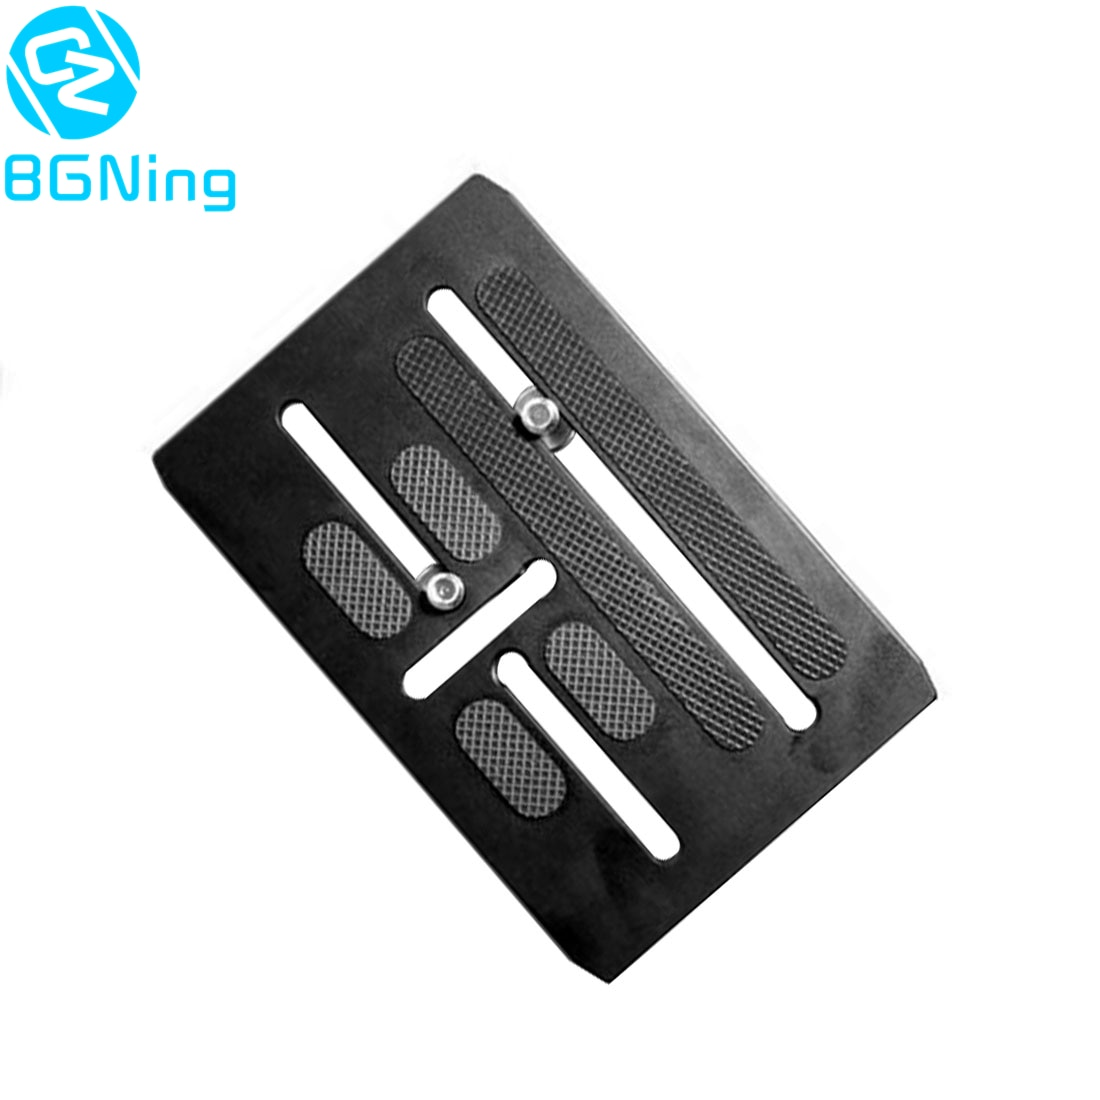 Kit de placa de liberación rápida para cámara BGNing para placa de montaje BMPCC 4K para grúa zhiyun Crane2 3 para cardán DJI Ronin S